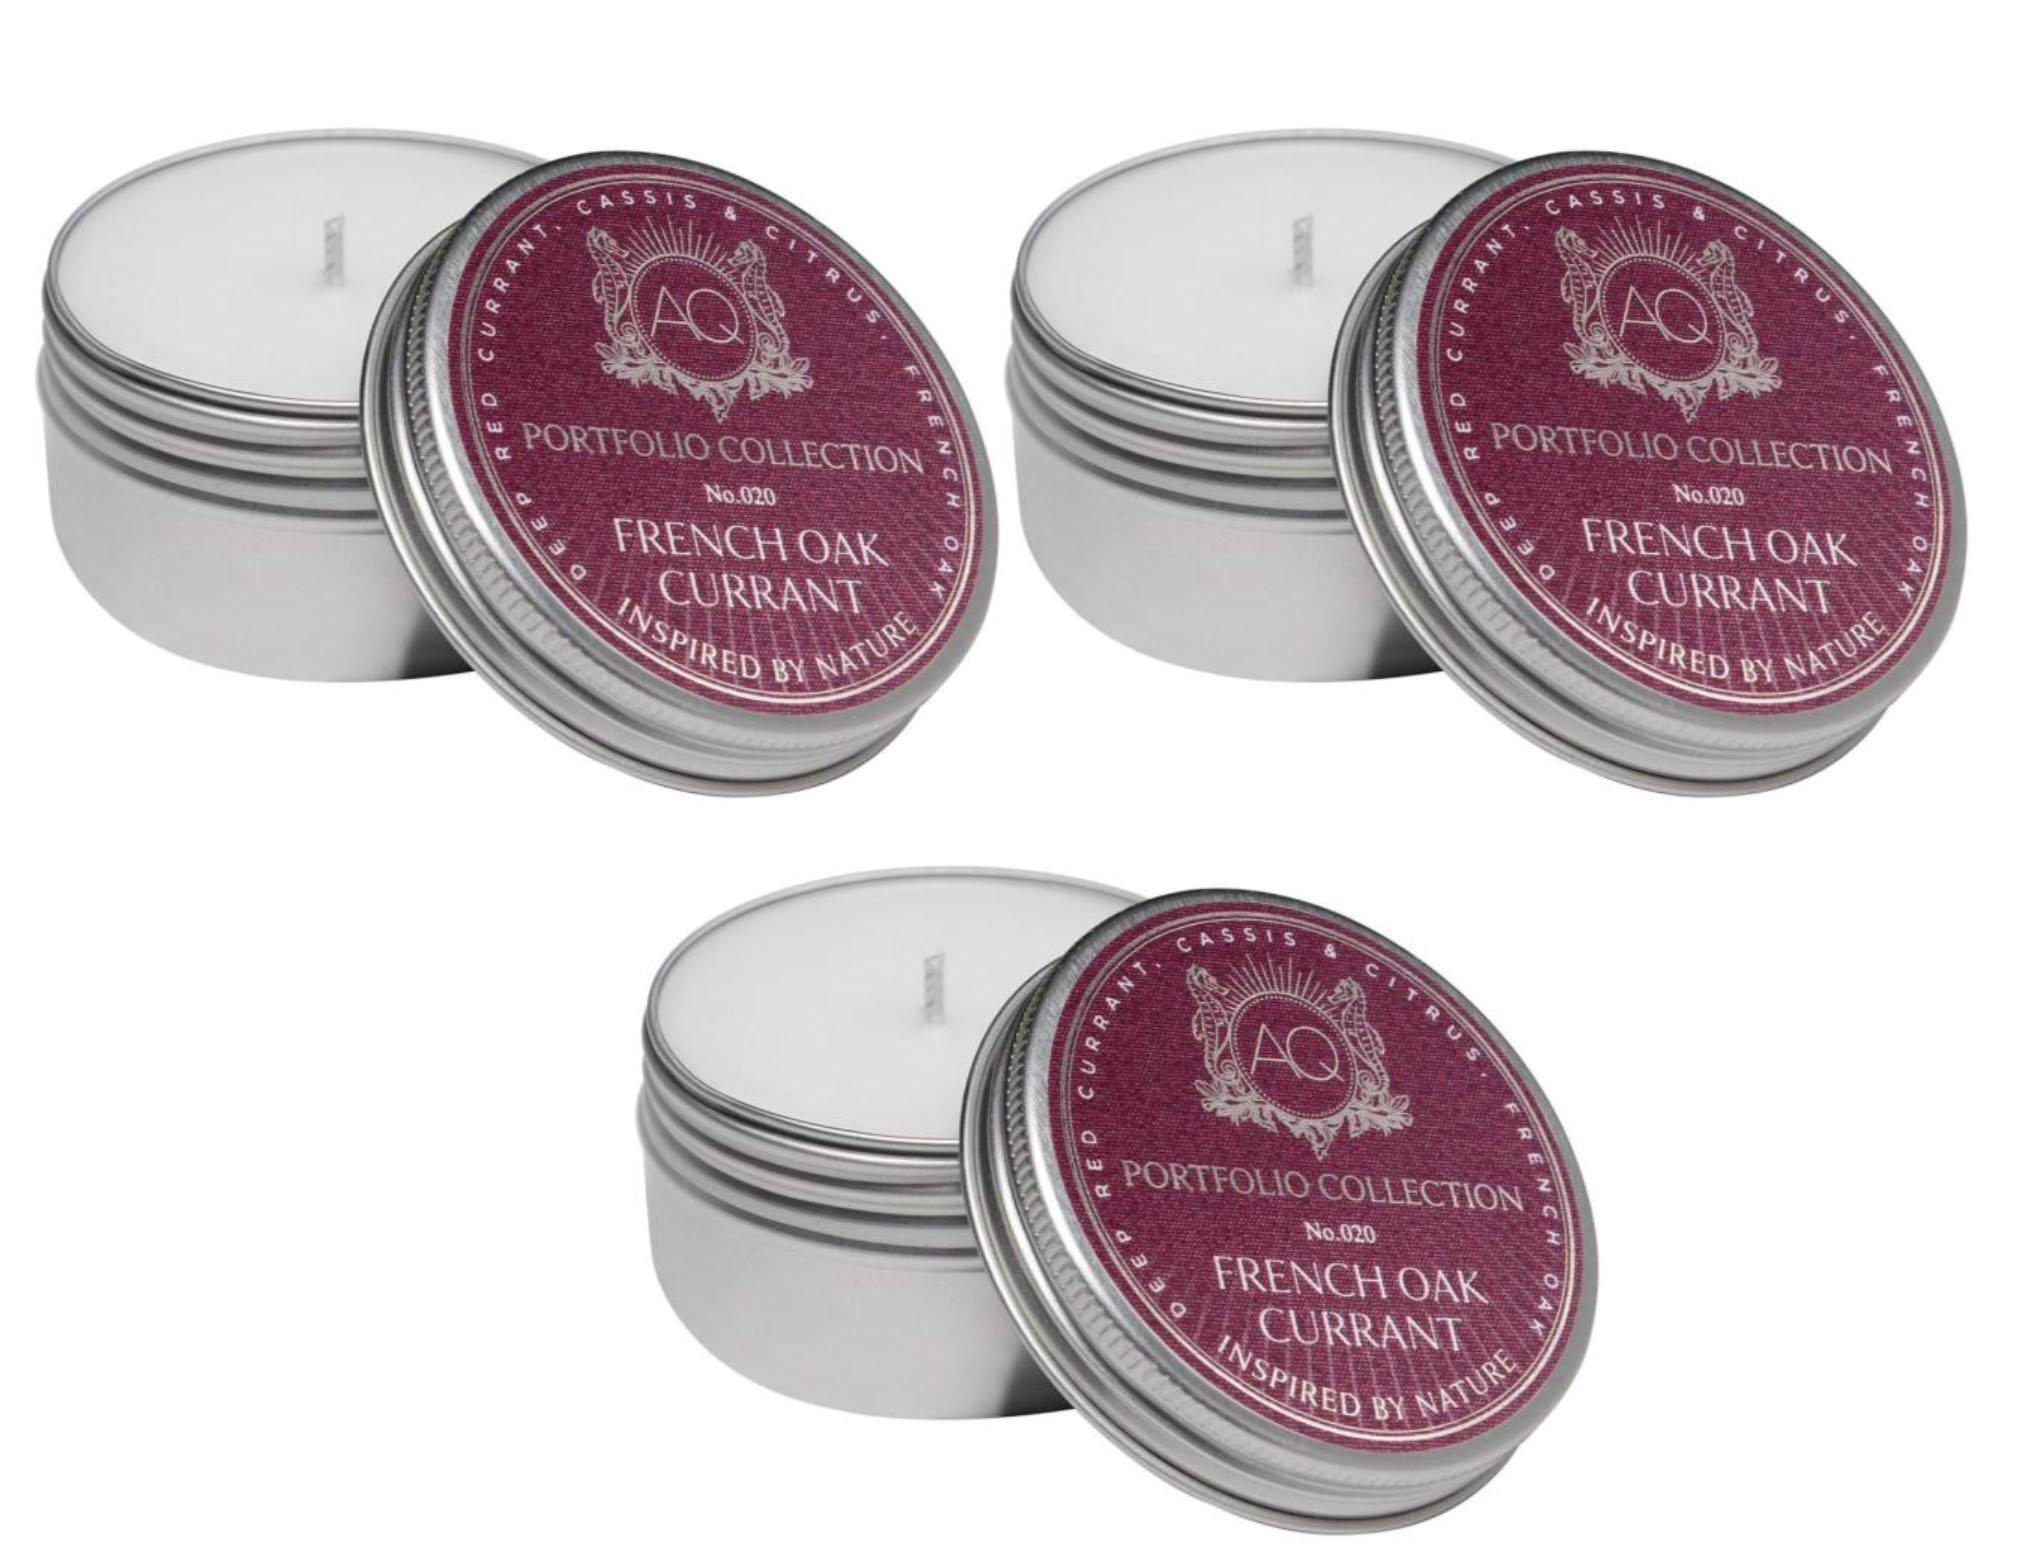 Aquiesse Travel Tin French Oak Currant 2 Oz - 3 Pack